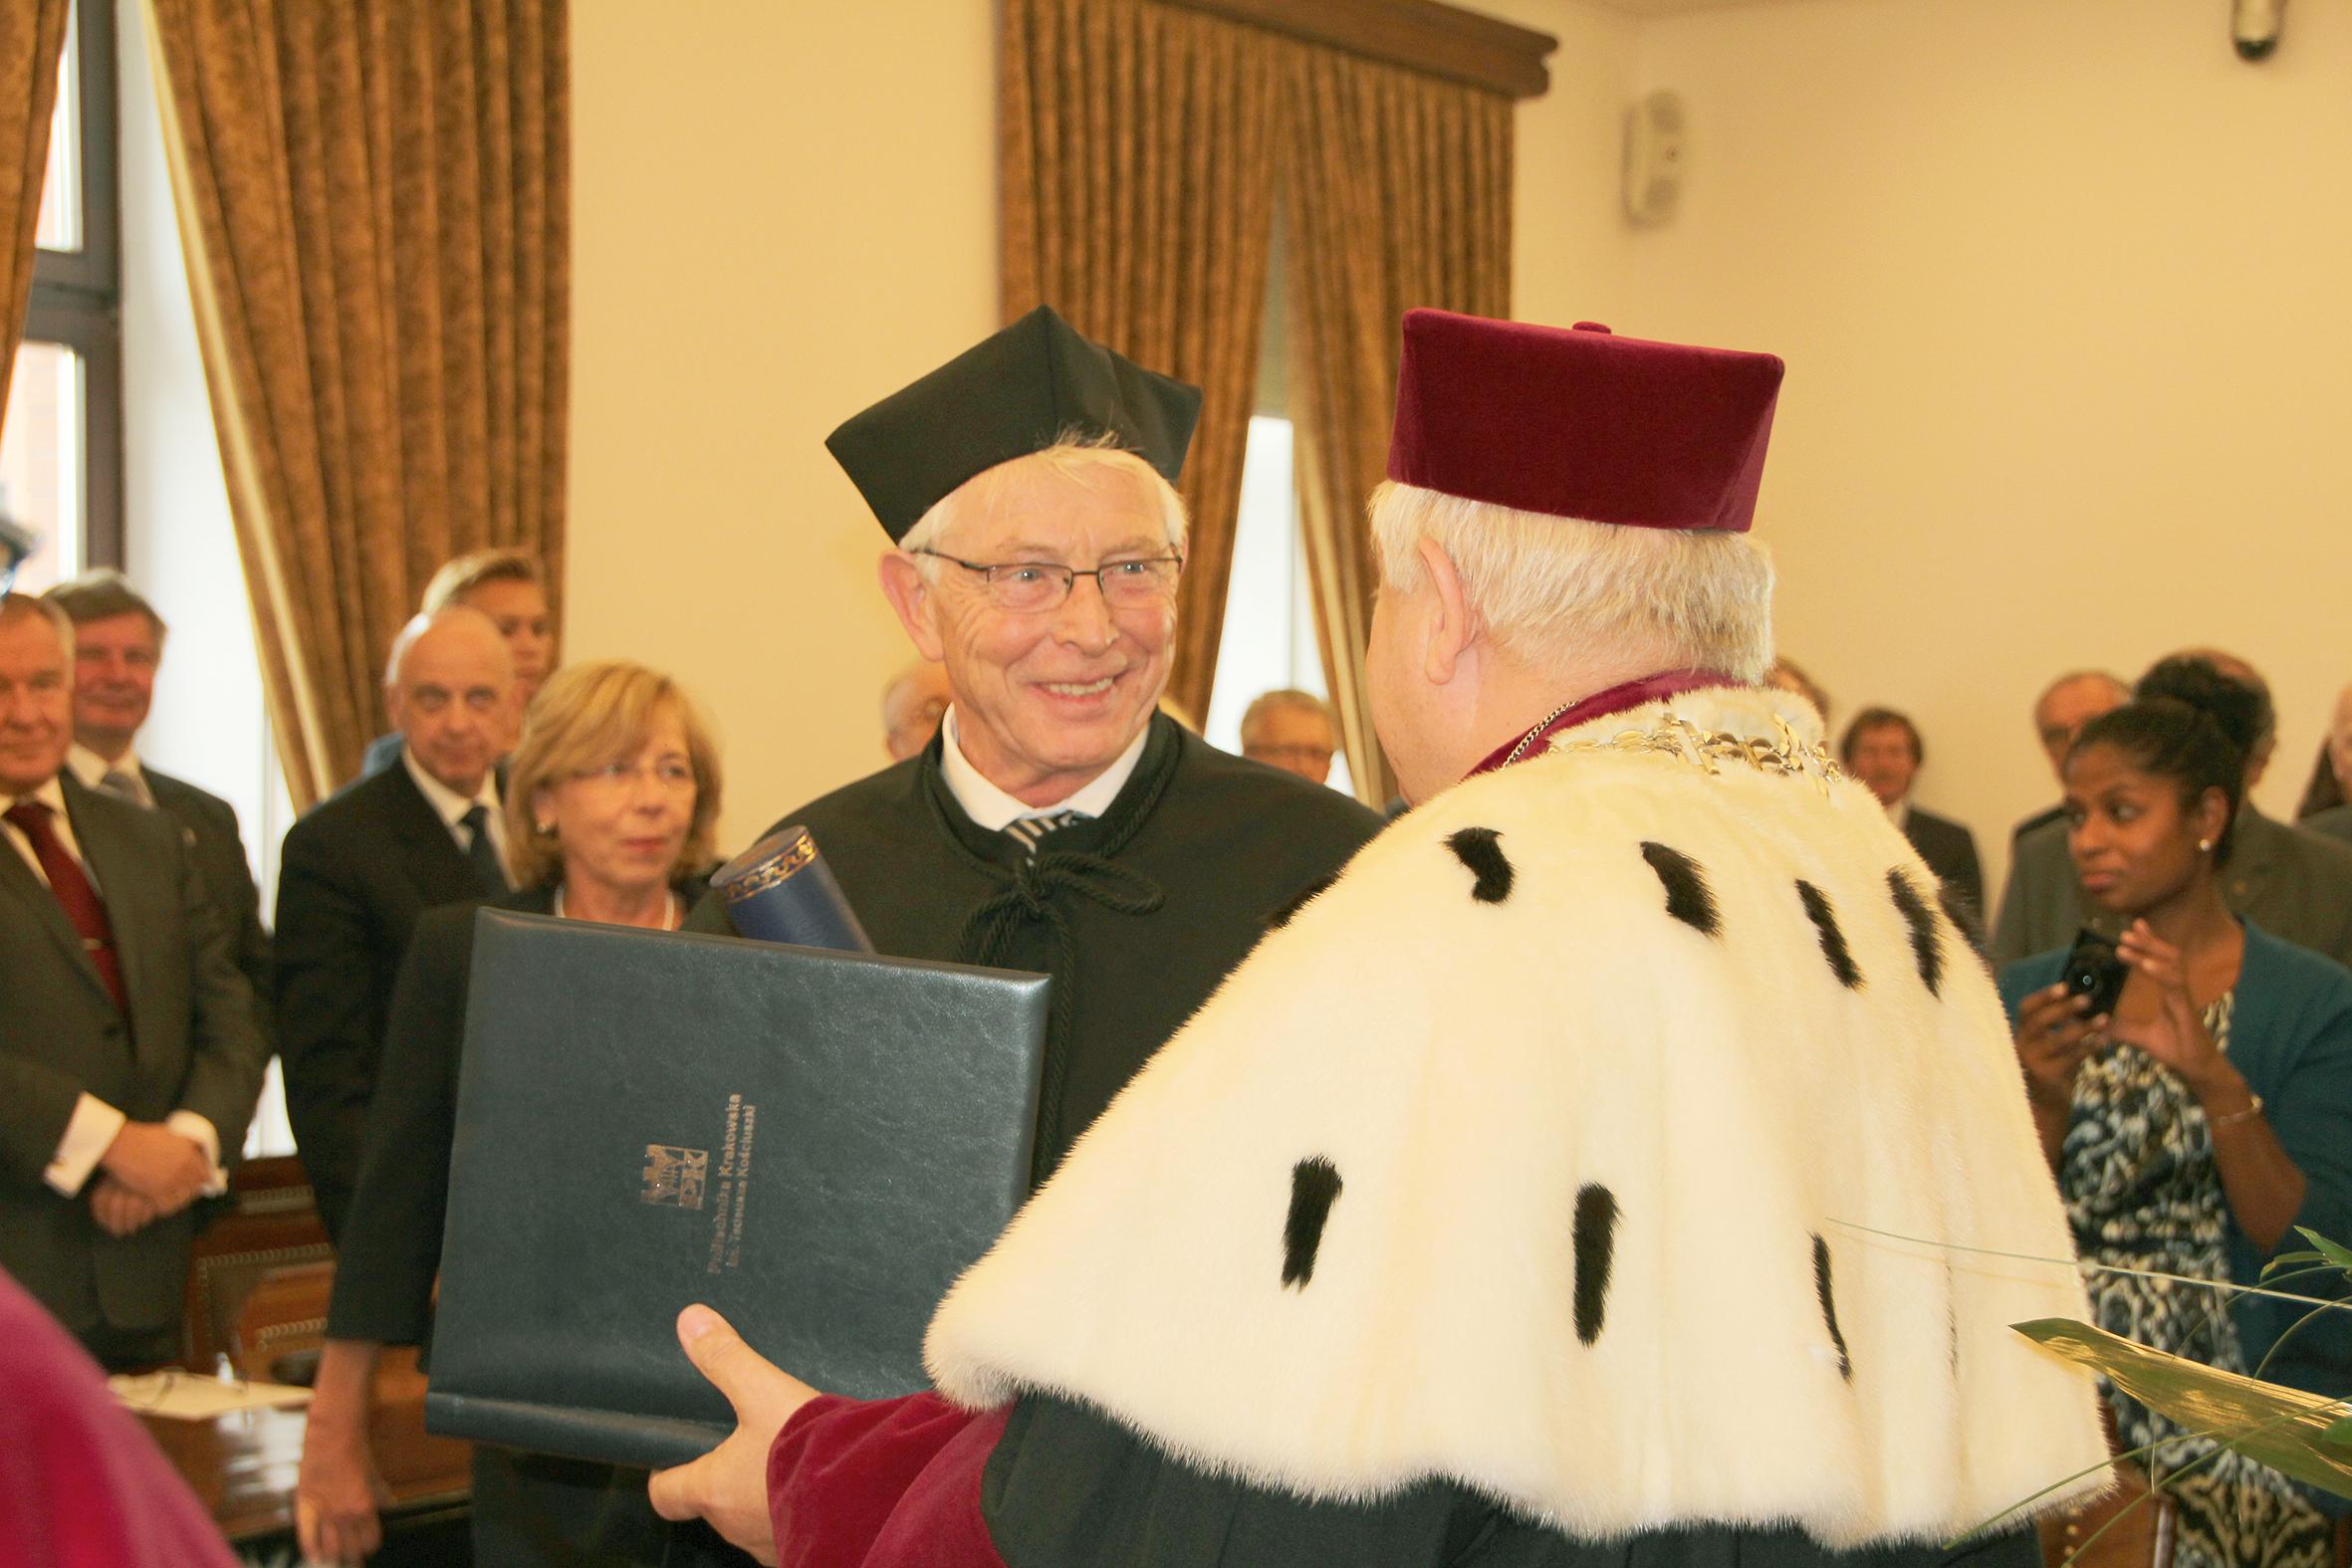 Prof. Dr. Richard Korff, Prof. Dr. Kazimierz Furtak